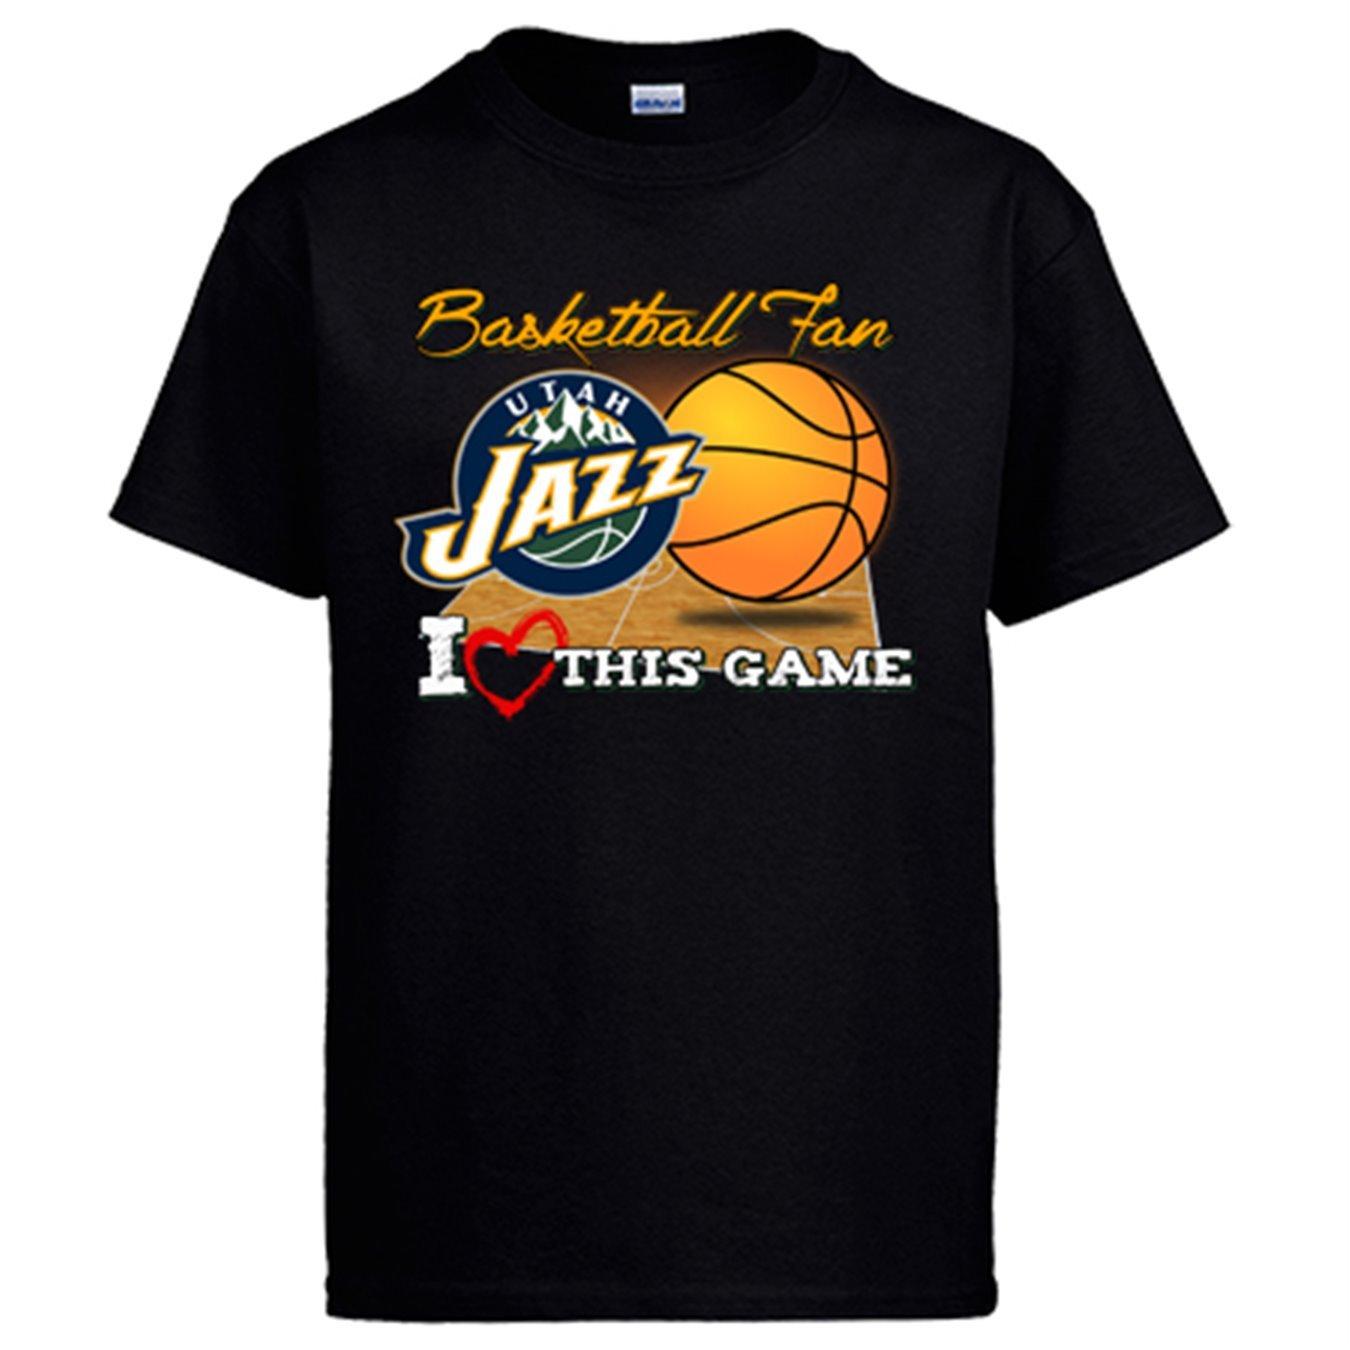 Camiseta NBA Utah Jazz Baloncesto Basketball Fan I Love This Game: Amazon.es: Ropa y accesorios